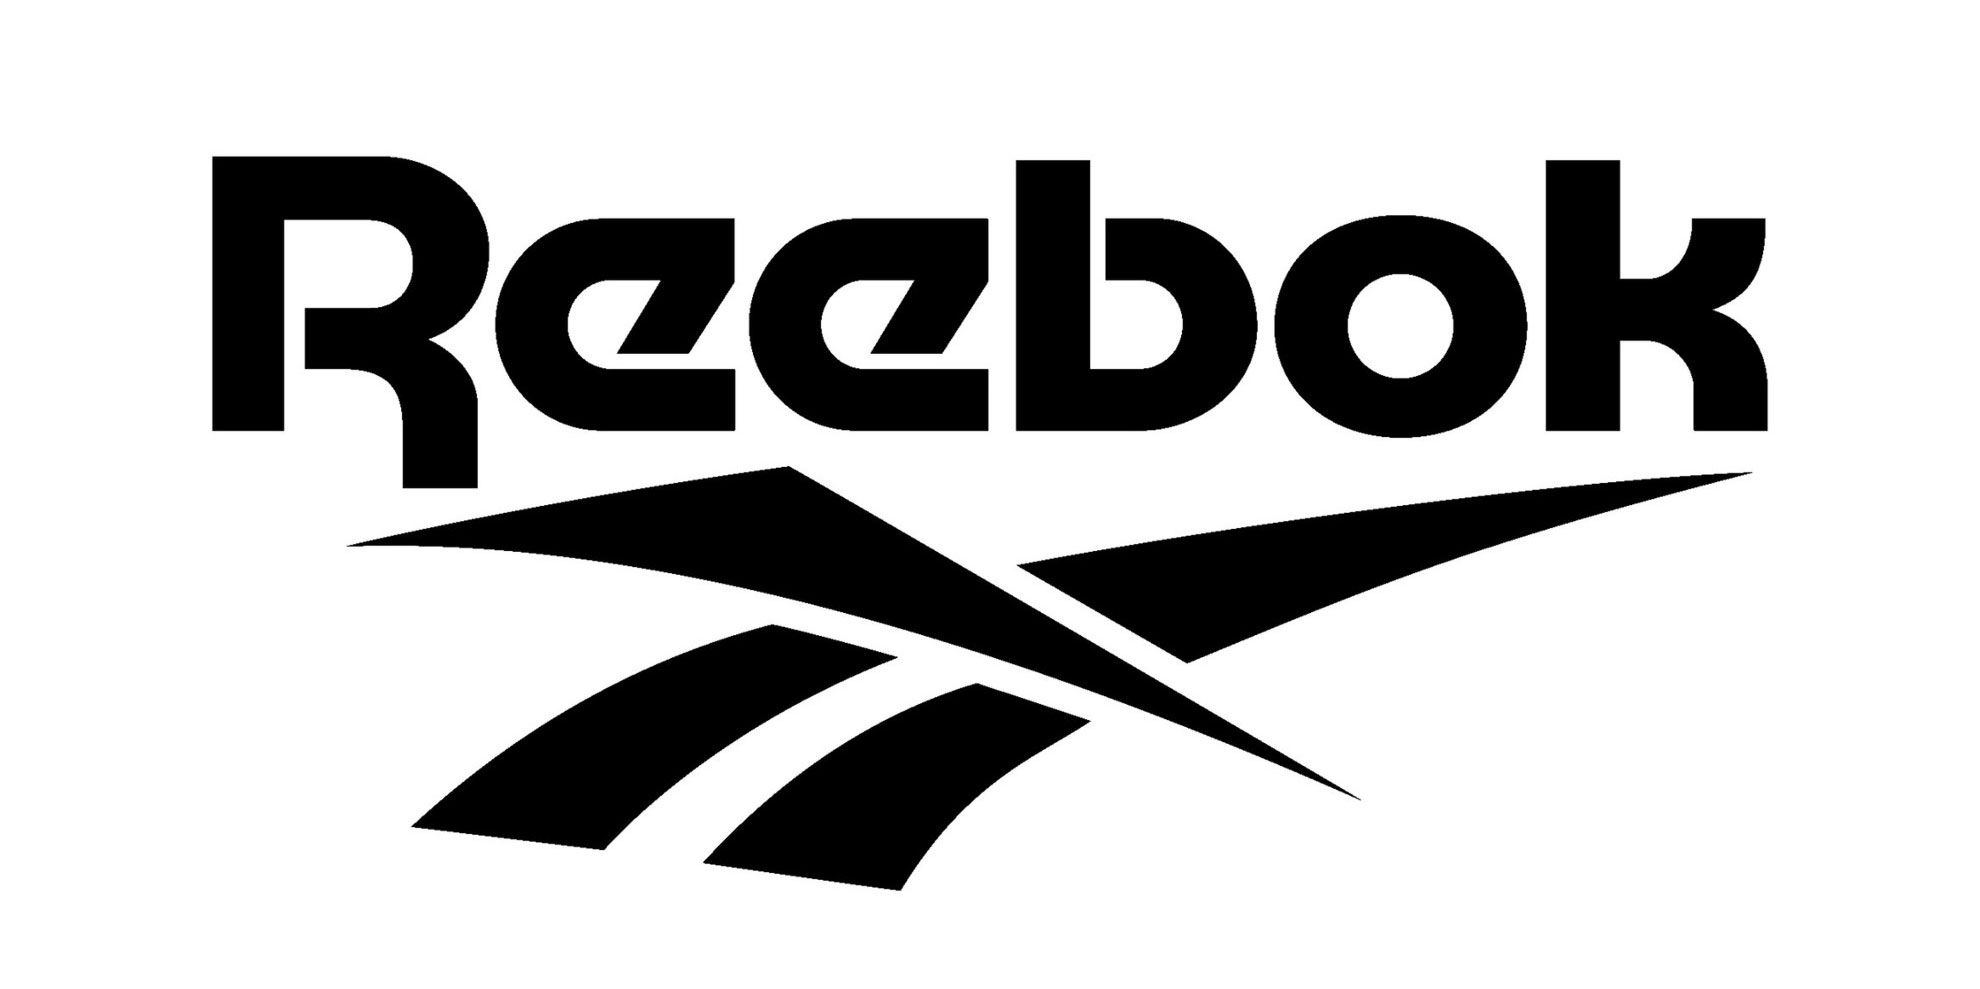 reebok sign in